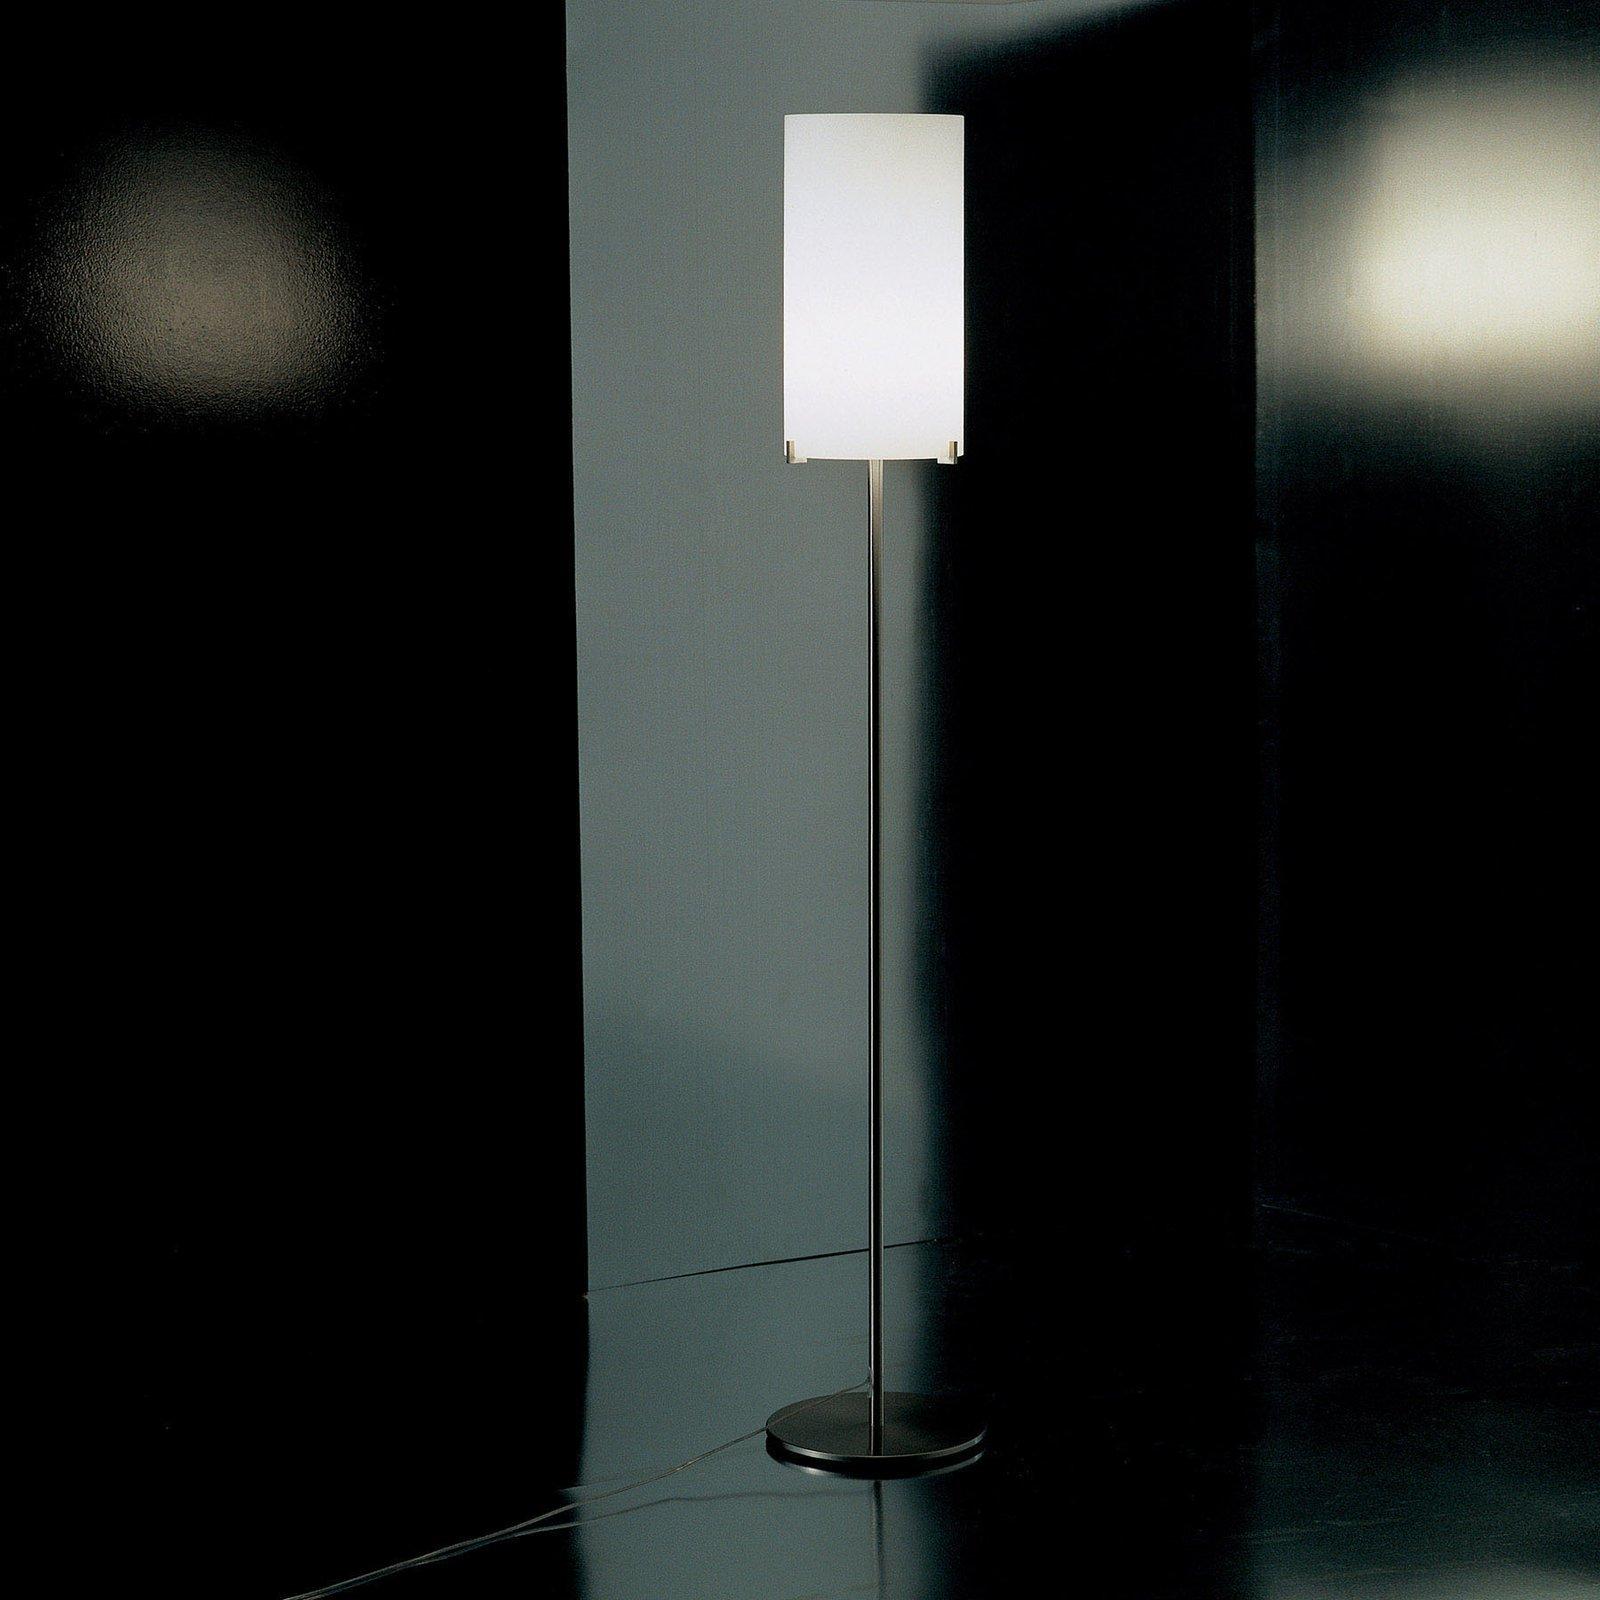 Prandina CPL F1 gulvlampe krom, glass opal